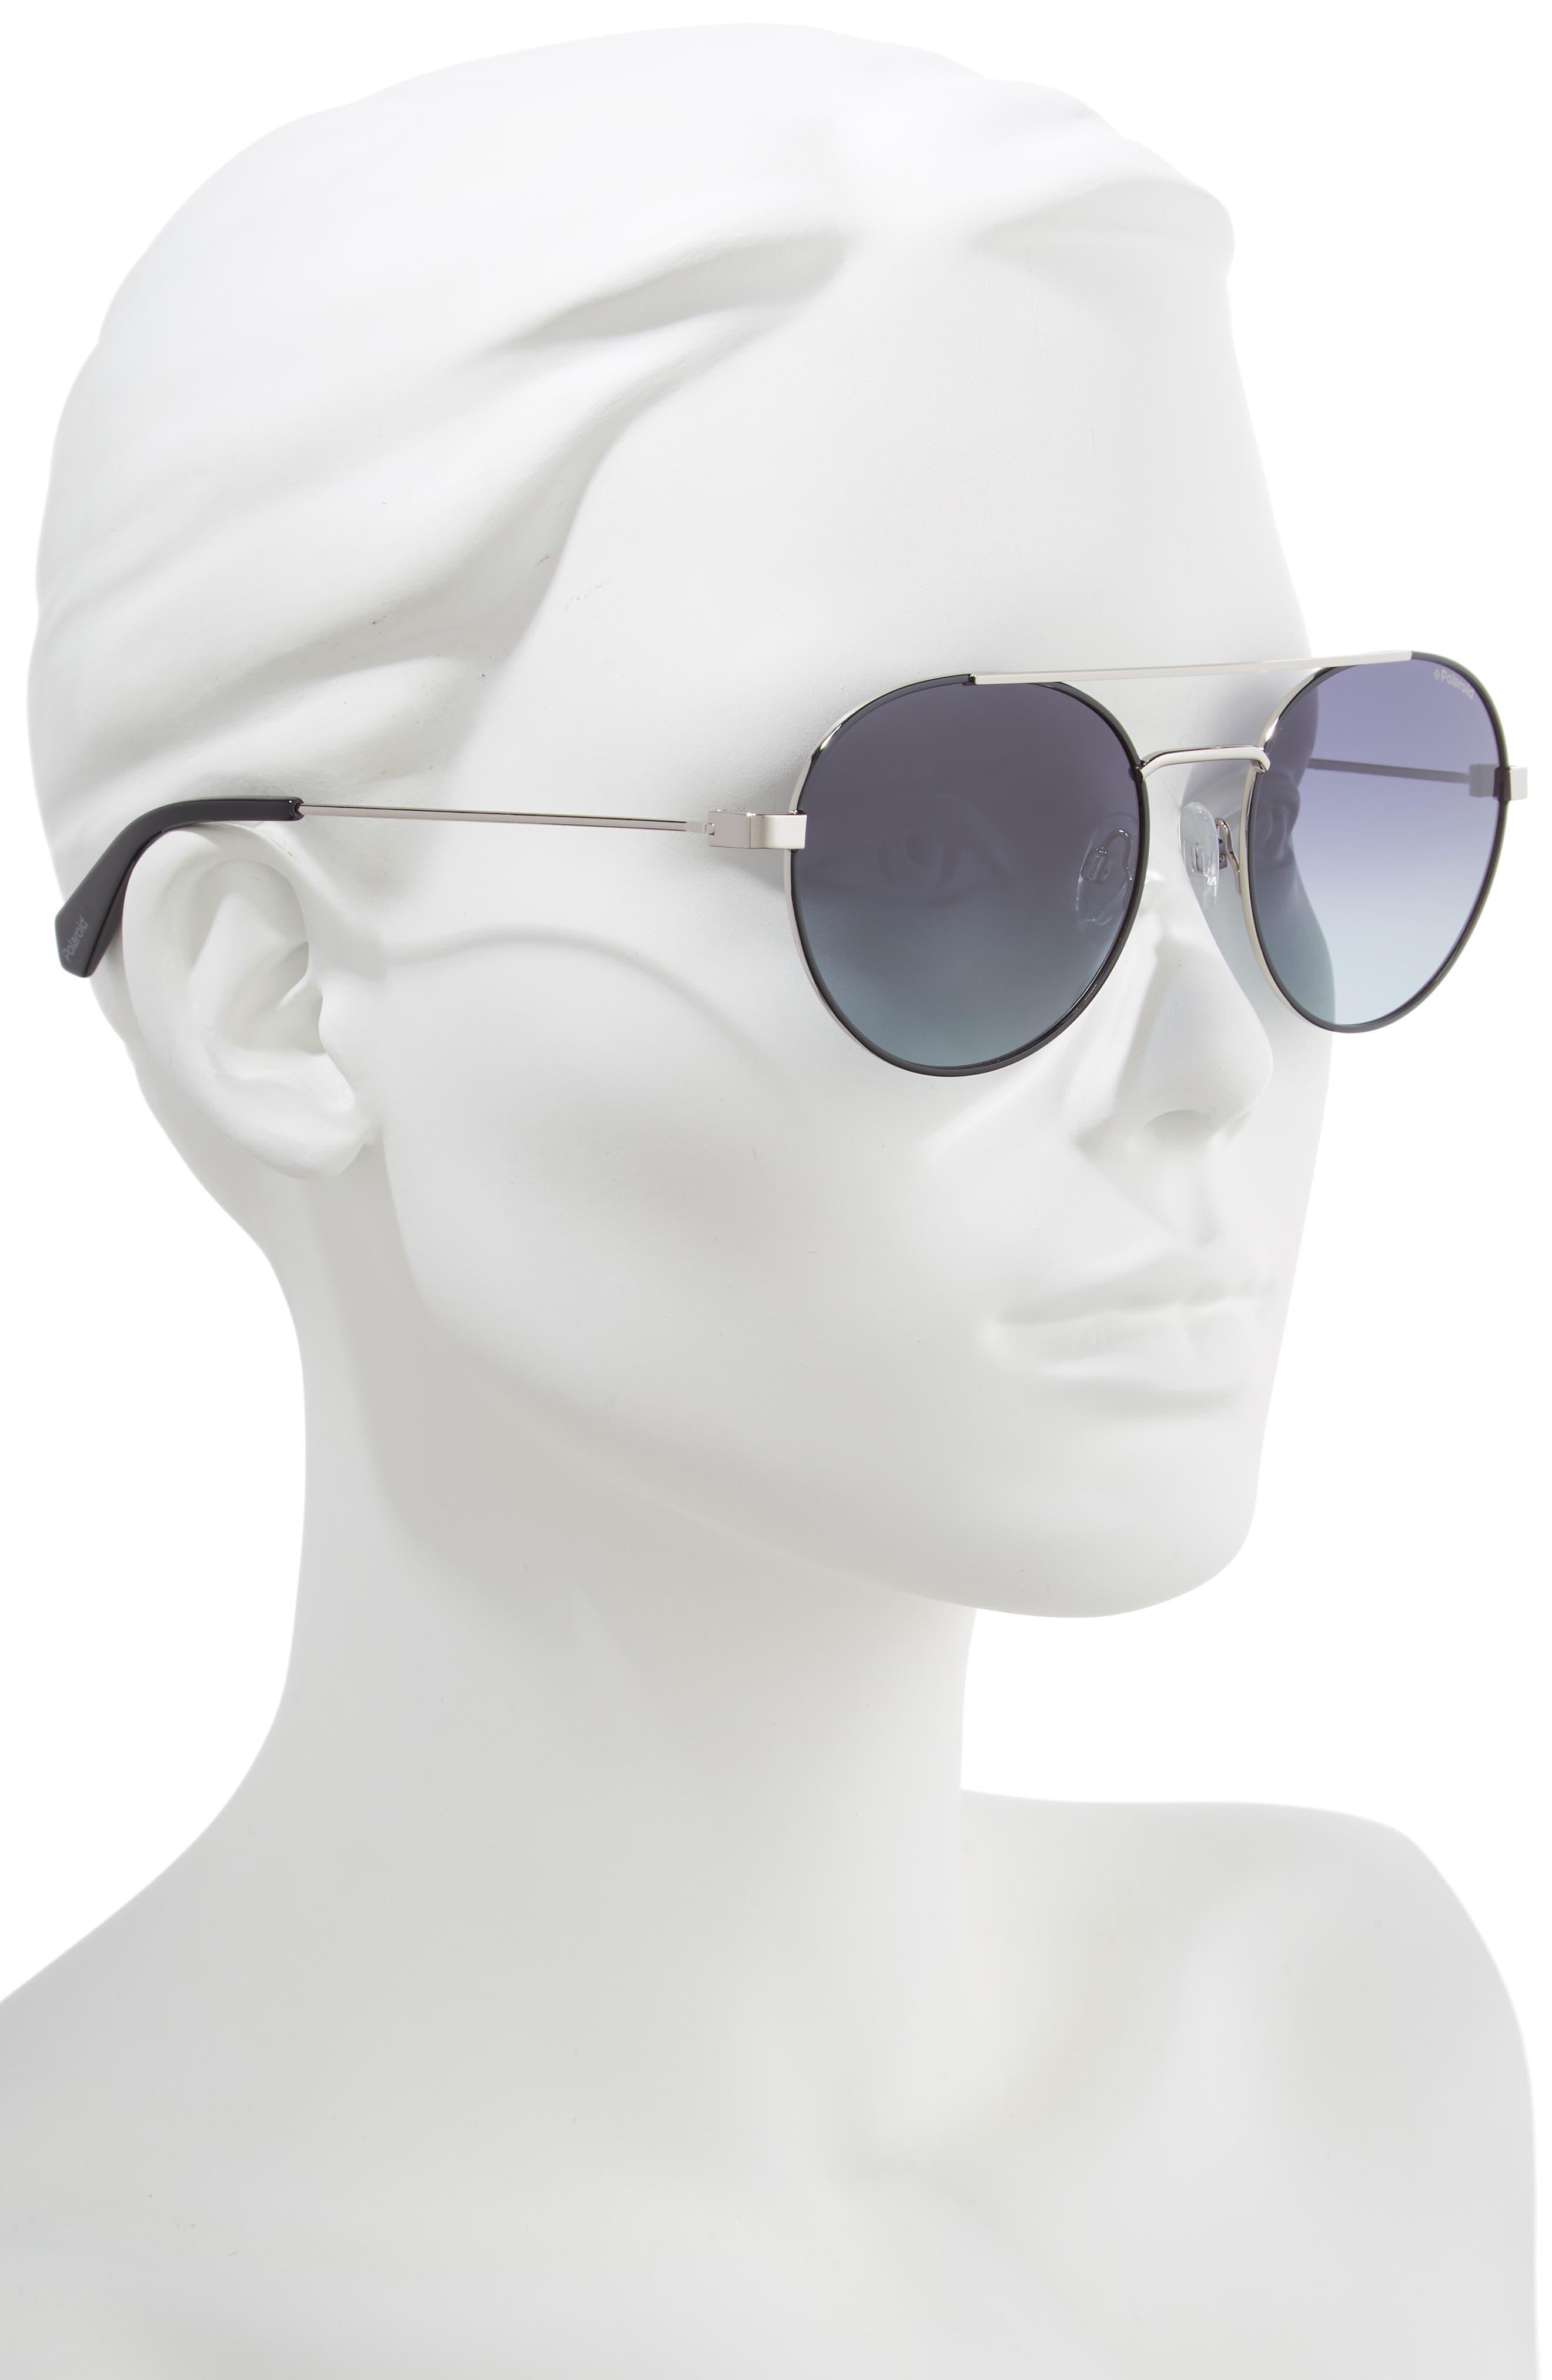 POLAROID EYEWEAR,                             Polaroid 55mm Polarized Round Aviator Sunglasses,                             Alternate thumbnail 2, color,                             BLACK RUTHENIUM